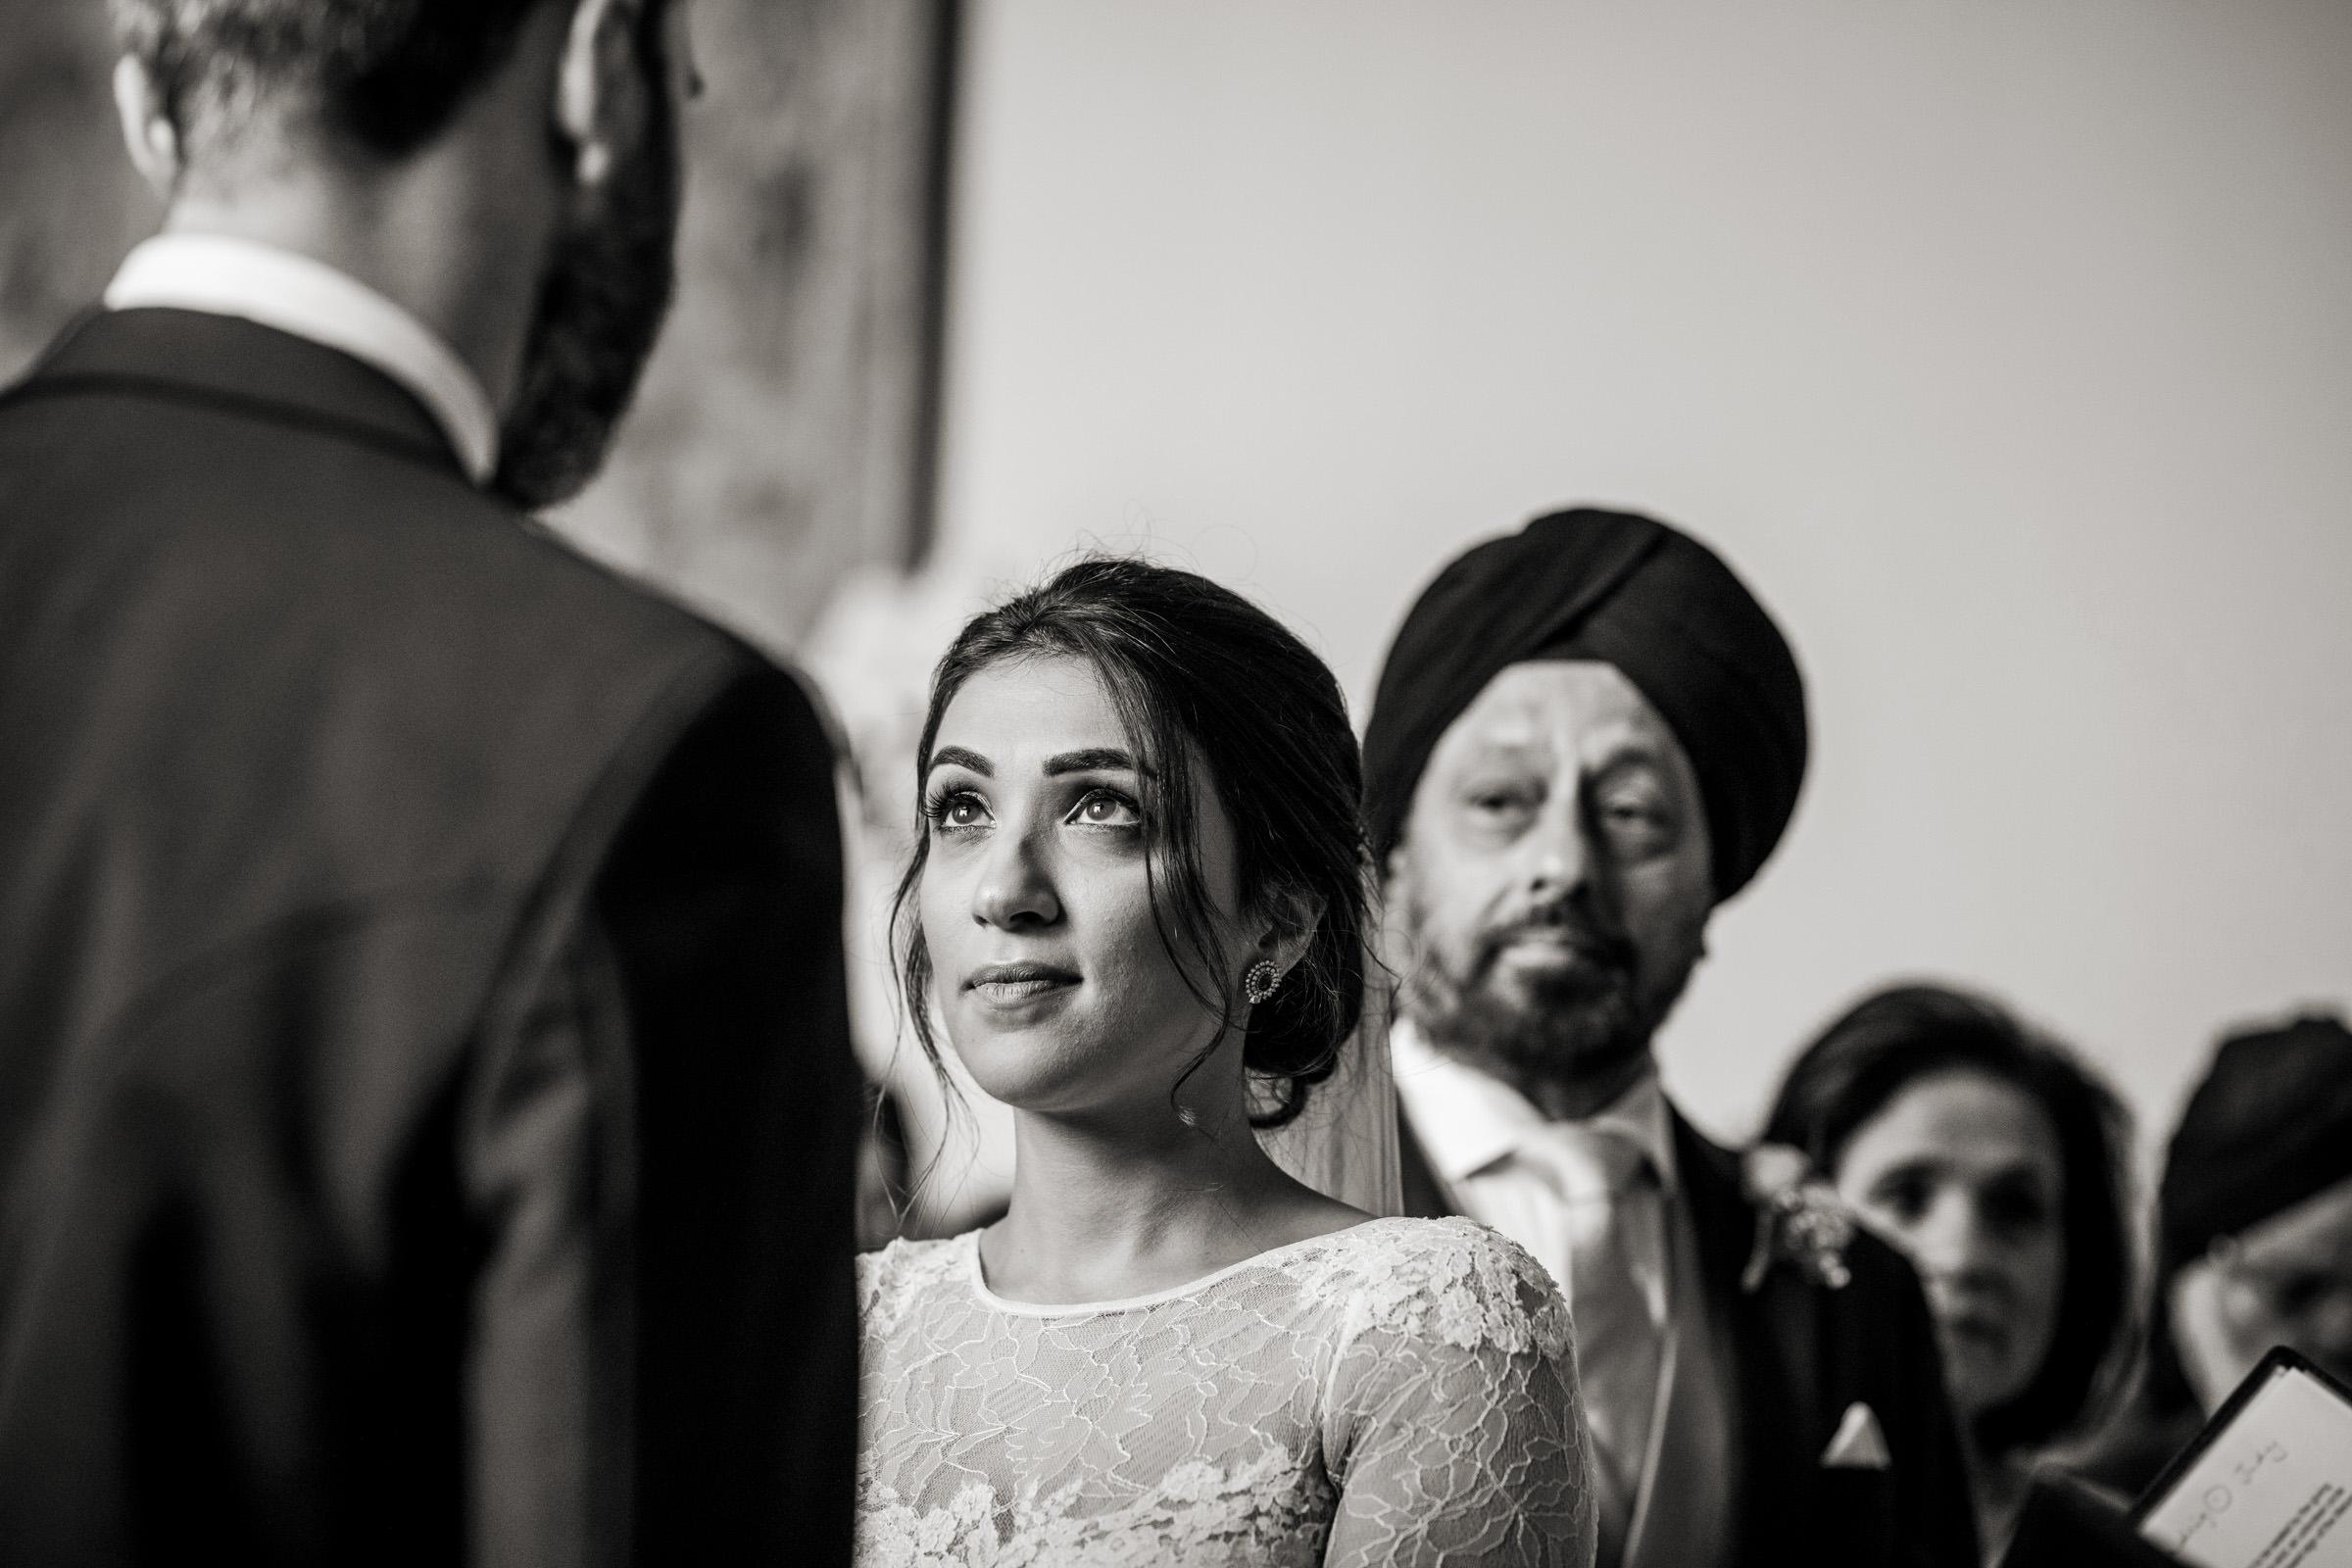 ceremony wedding photography at Elmore Court